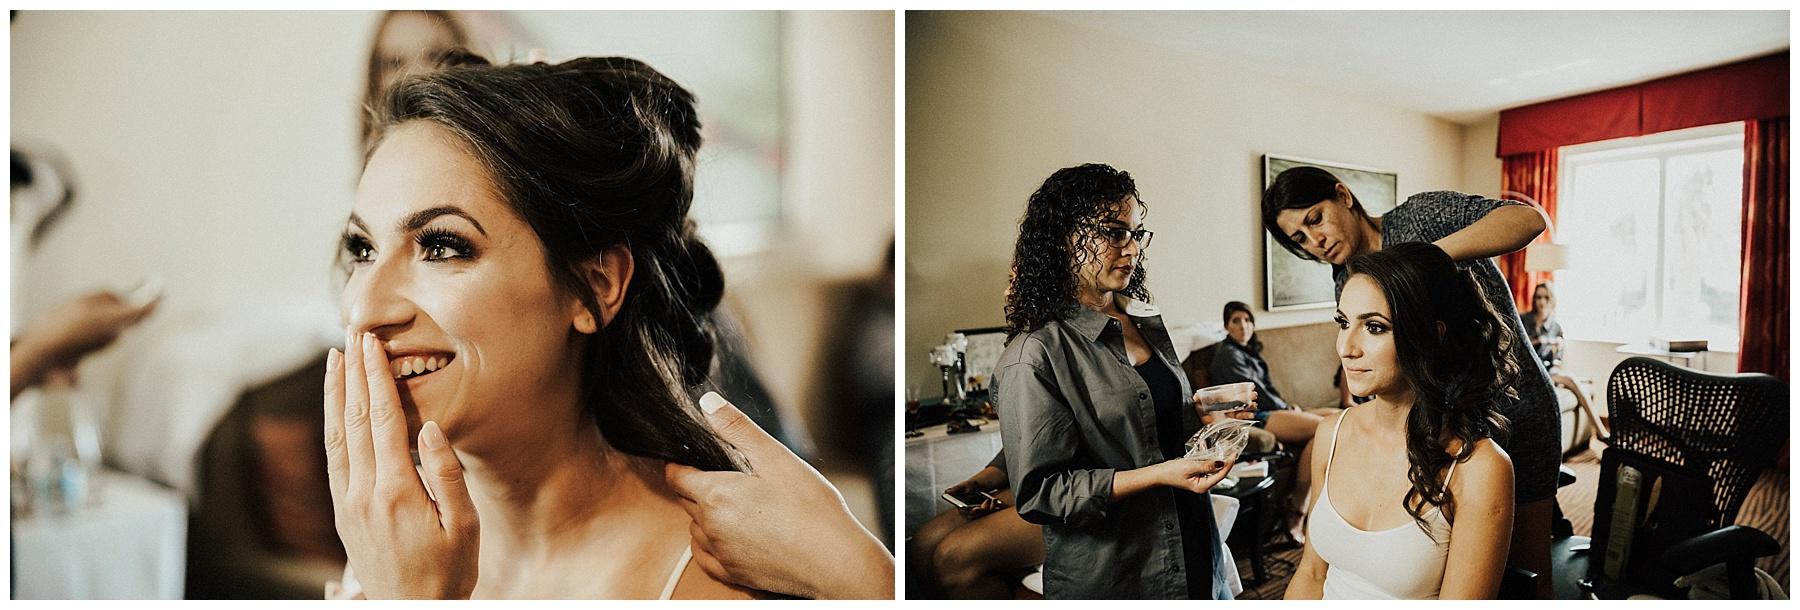 YBOR Wedding Tampa Wedding Photographer-16.jpg